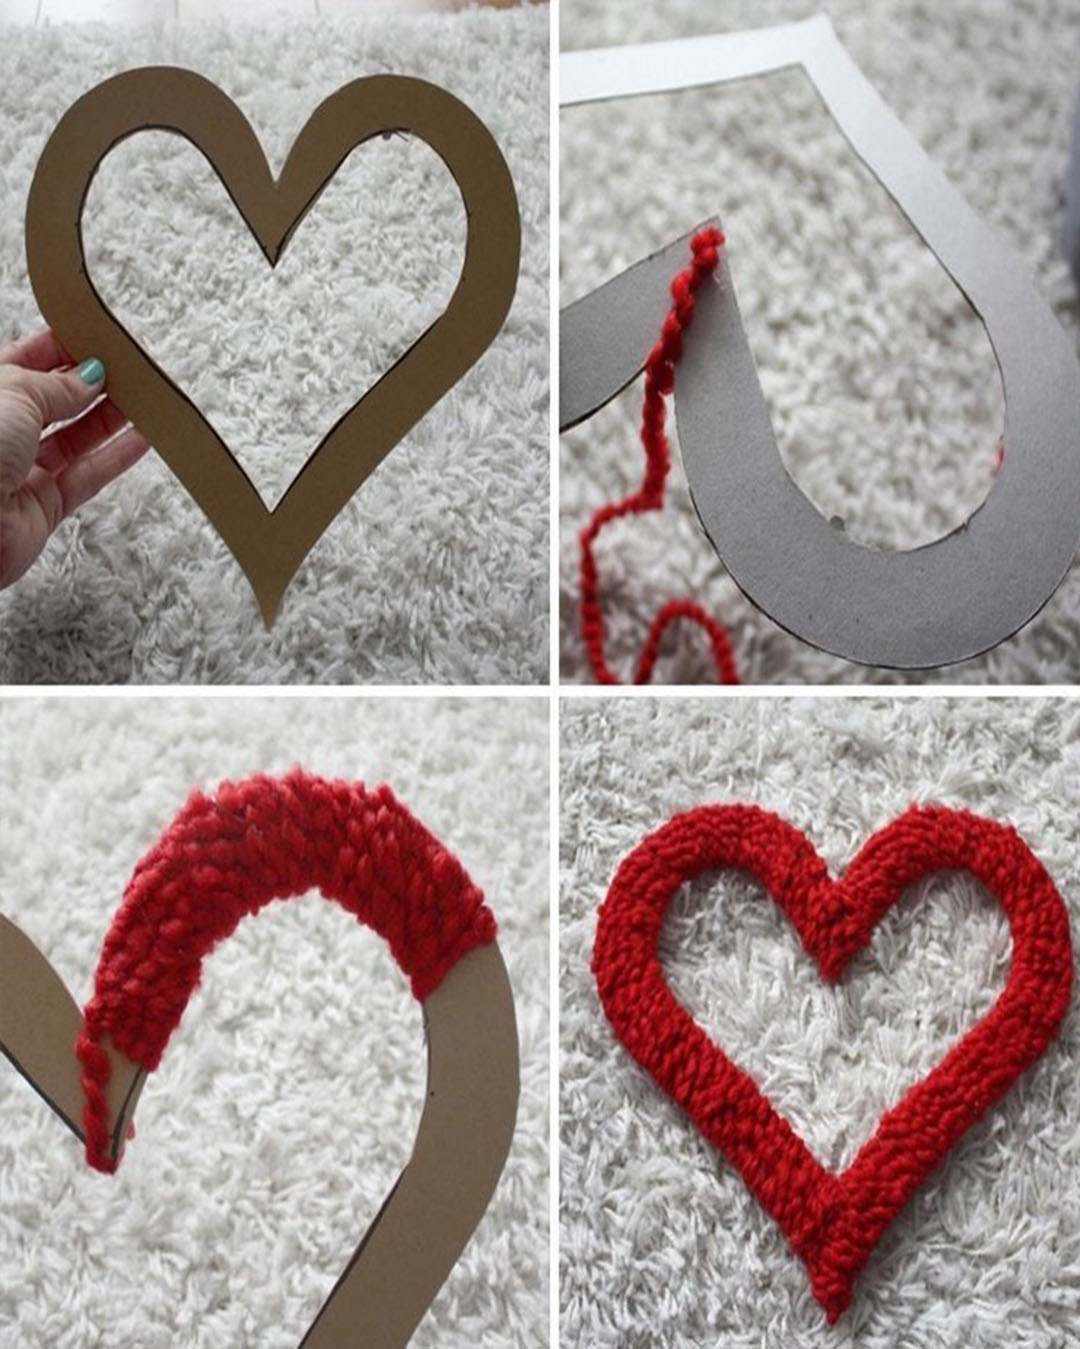 Regalos De San Valentin Para Mi Novio Manualidades.Ideas De Regalos Para San Valentin Diy Manualidades Faciles